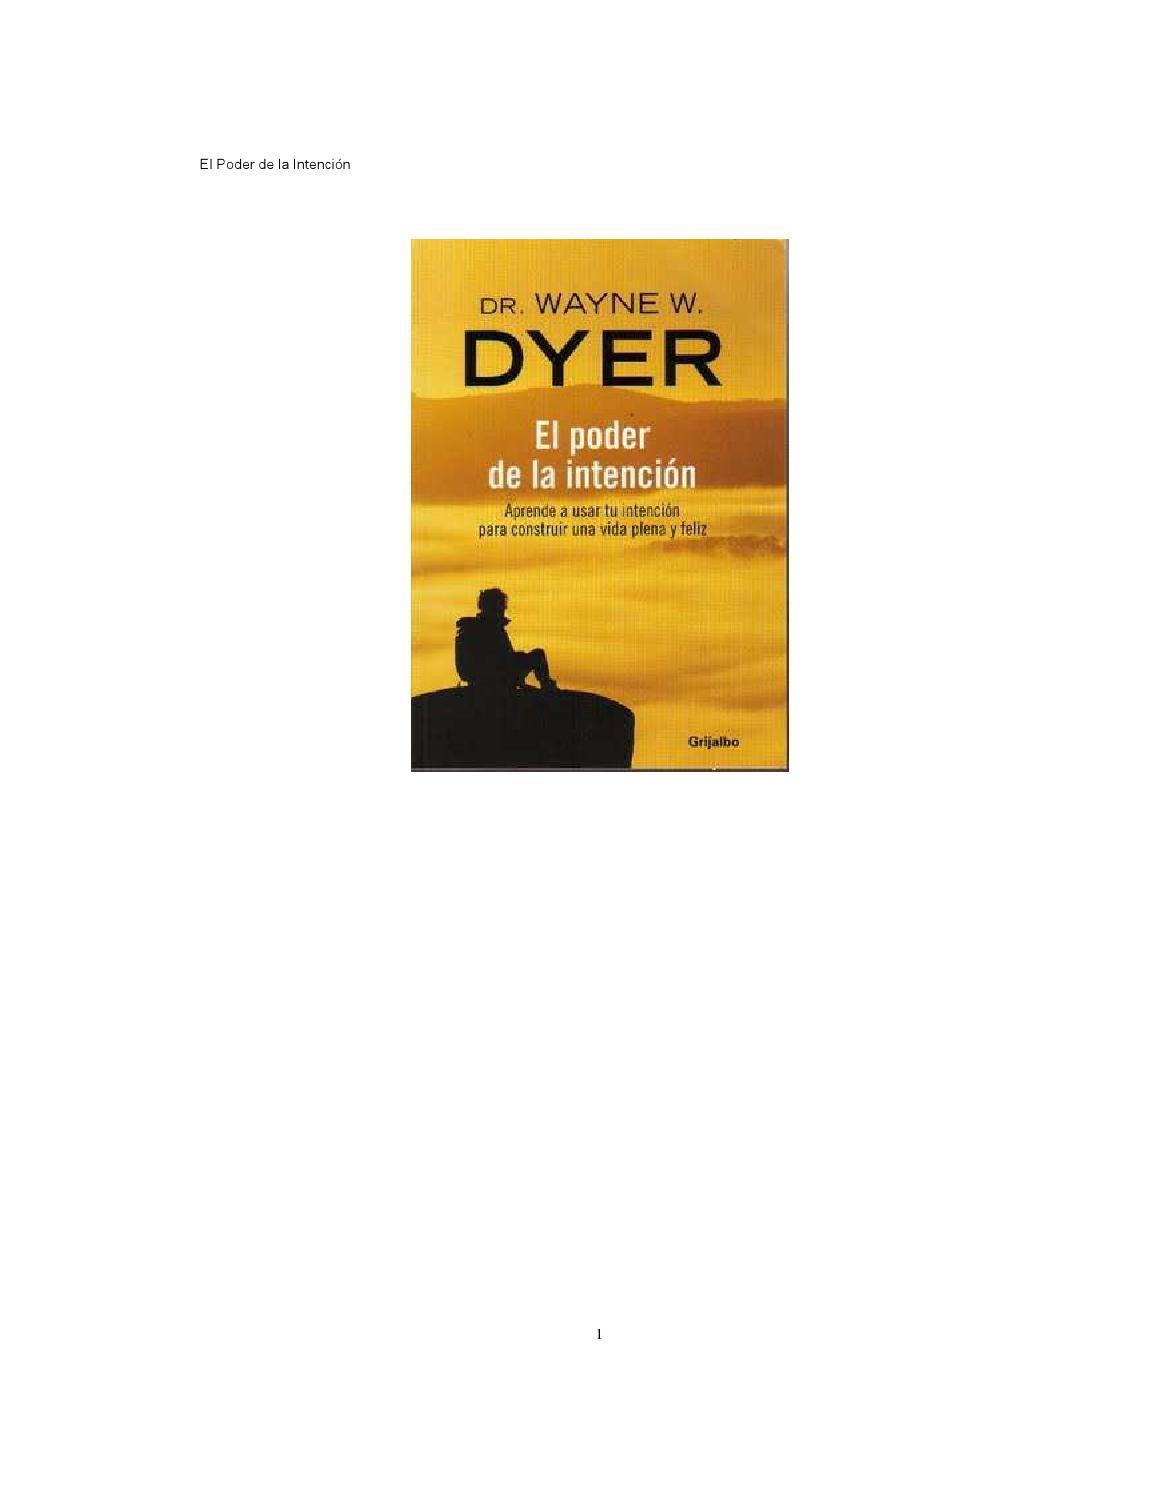 El poder de la intencion Dr Dyer Wayne by Ross Heredia - issuu